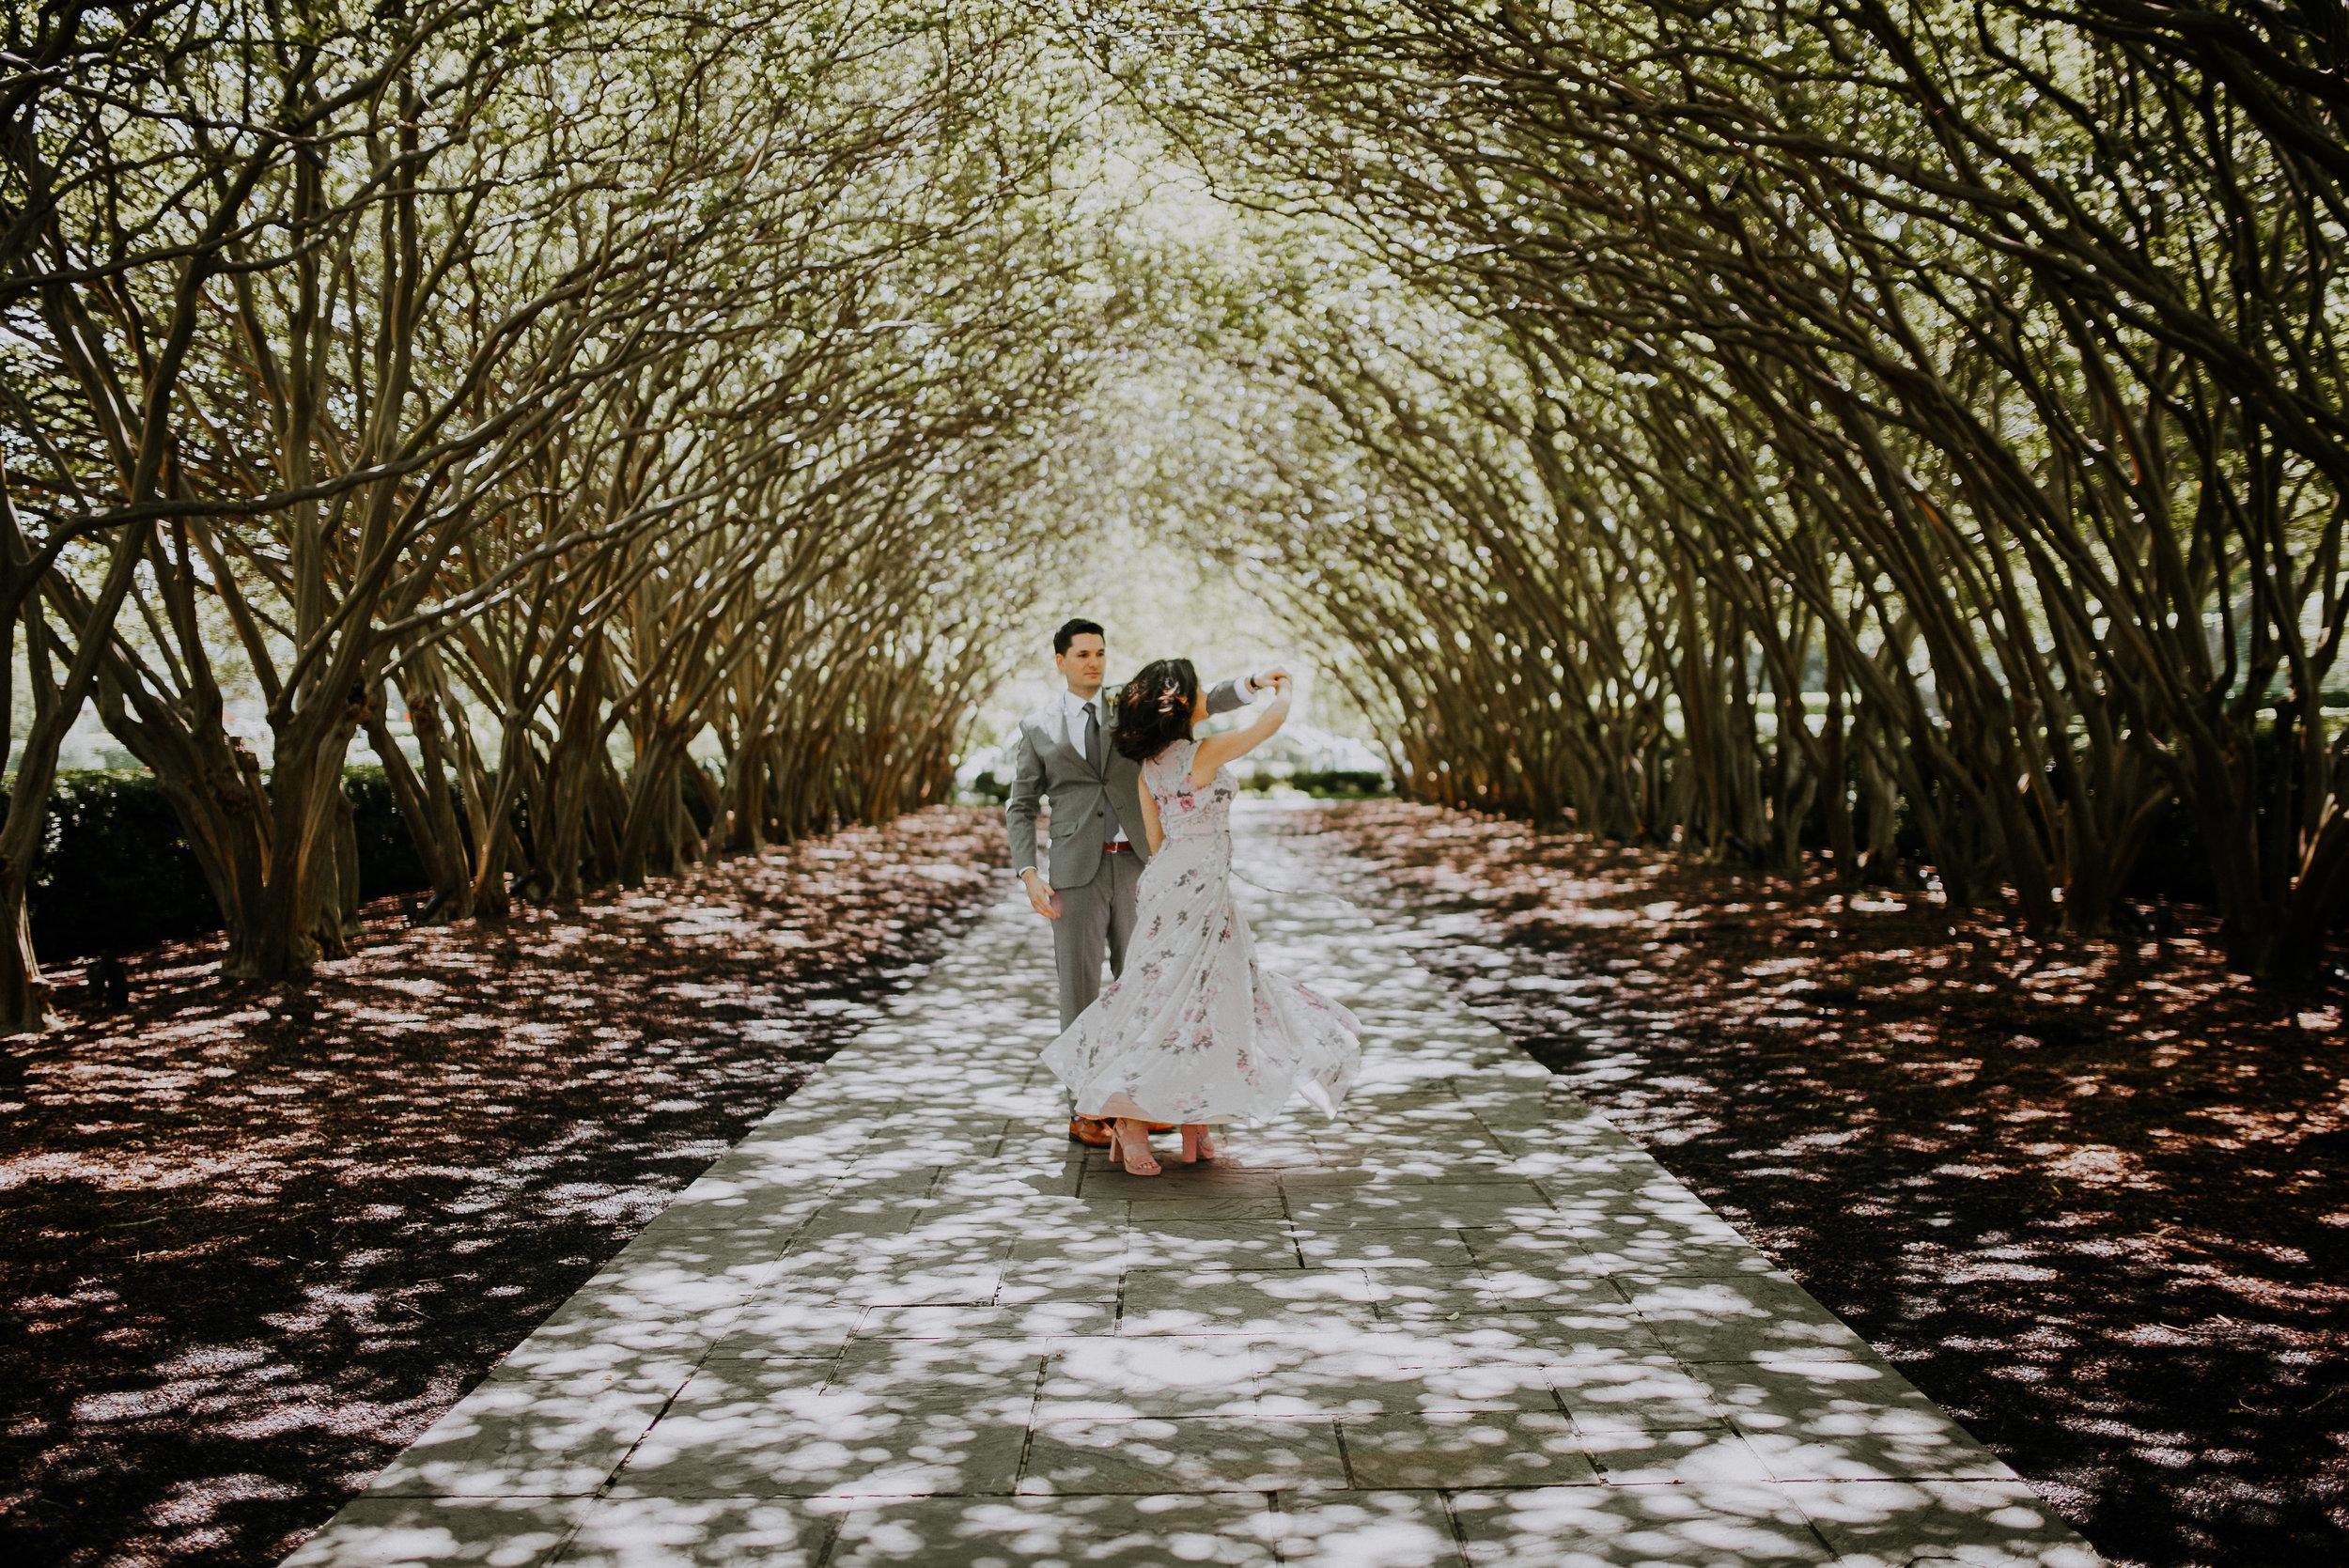 Dallas-fort-worth-wedding-photographer-dallas-arboretum-intimate-wedding-dallas-texas-39